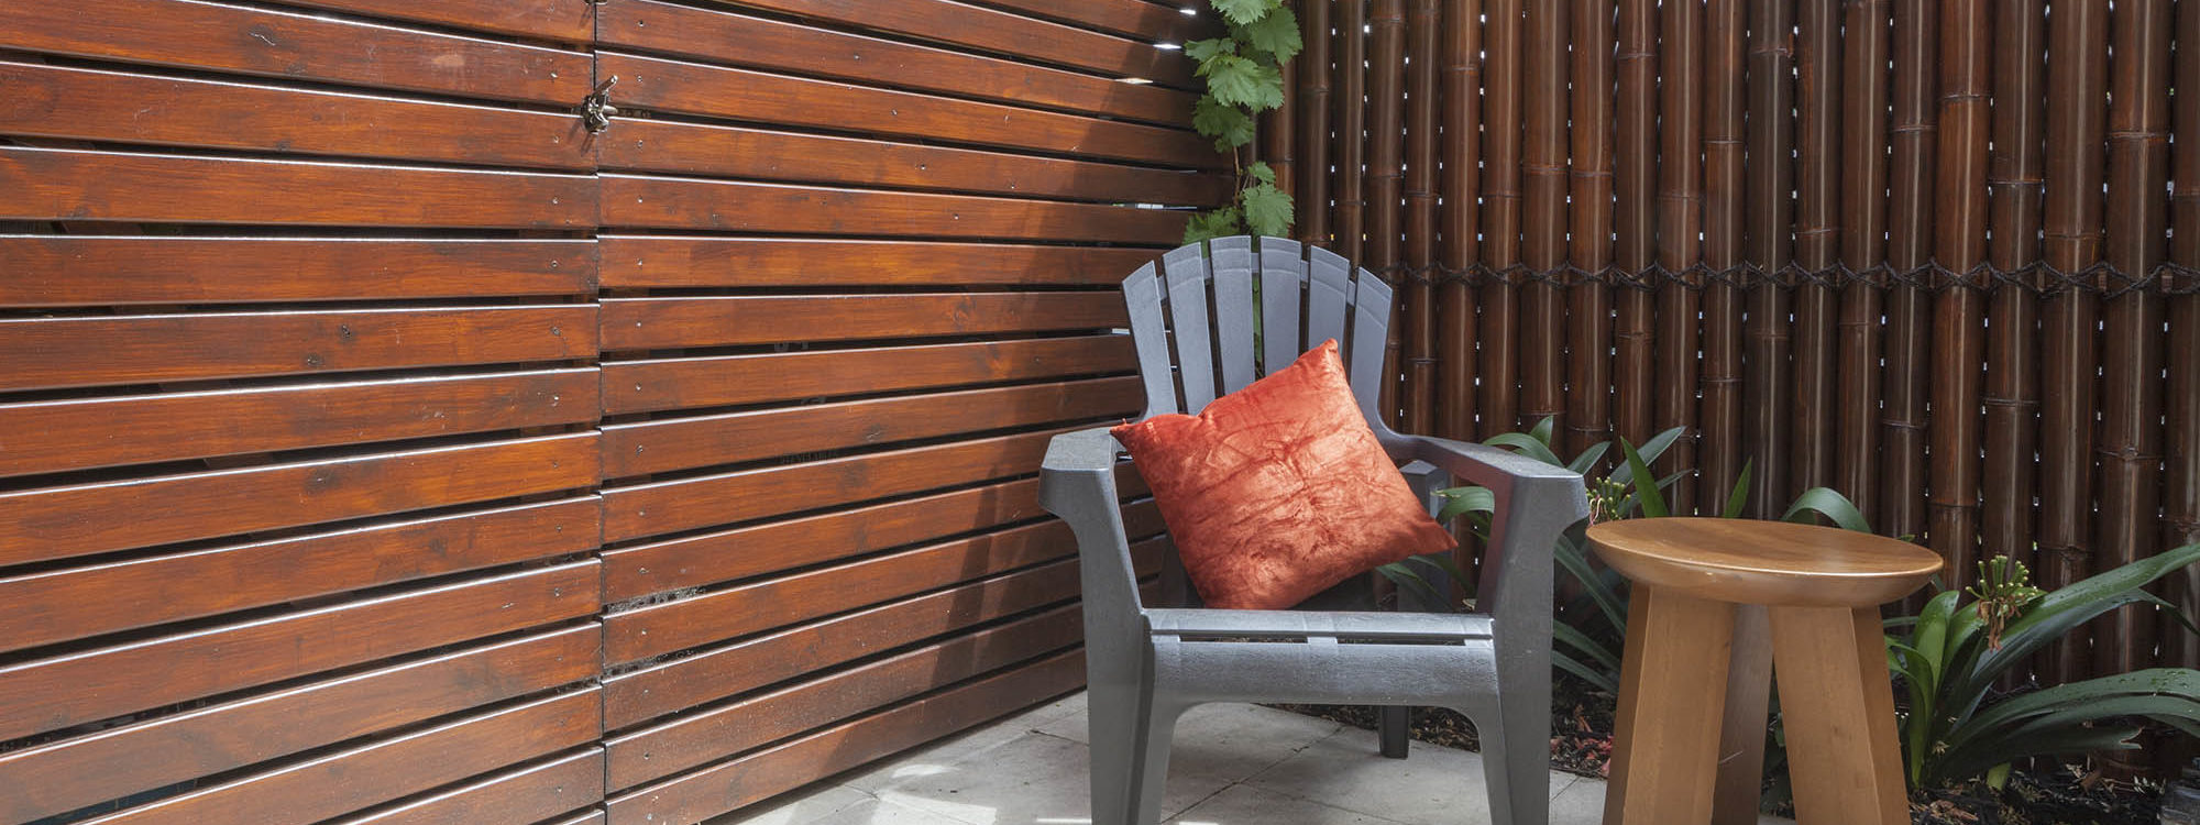 Somerset Terrace - Richmond - Outdoor Lounge Chair